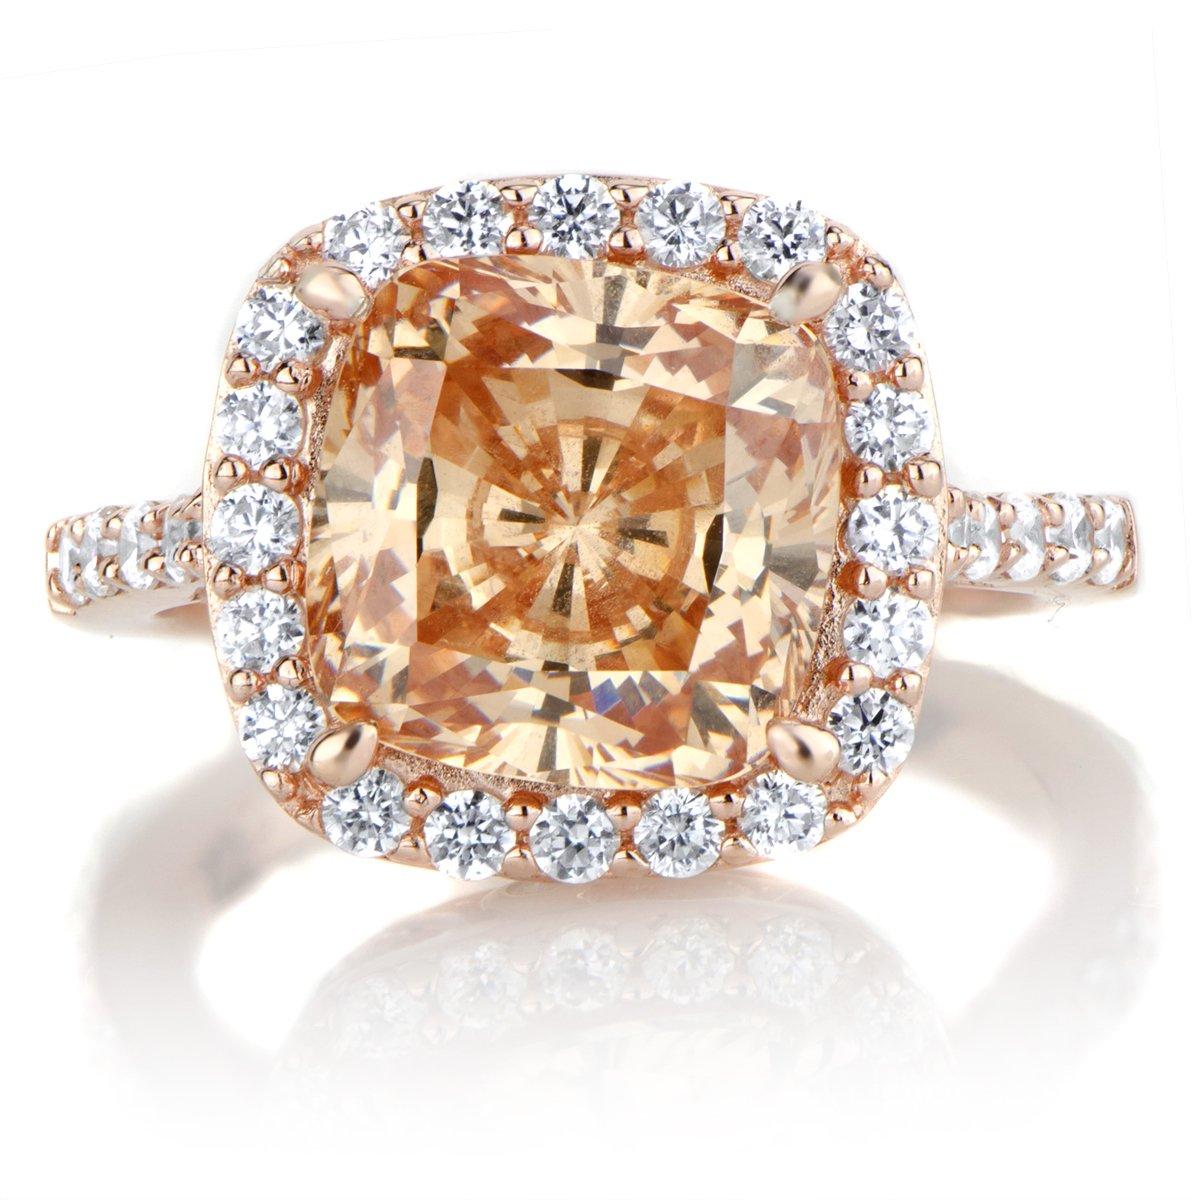 Emitations.com Sheeras 3.87ct Rose Goldtone and Peach CZ Cushion Cut Halo Engagement Ring